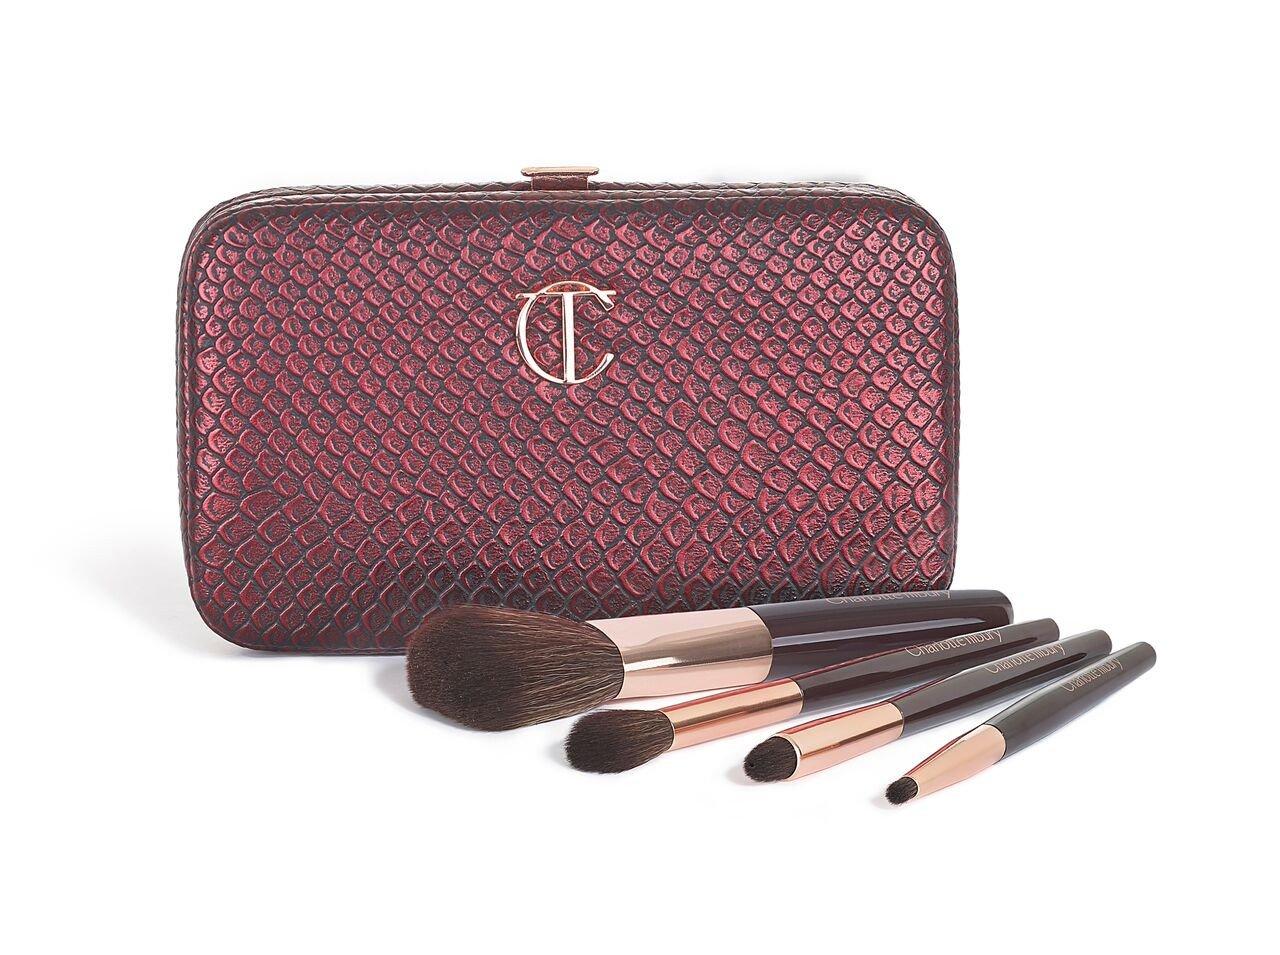 Charlotte Tilbury Magical Mini Brush Set Limited Edition